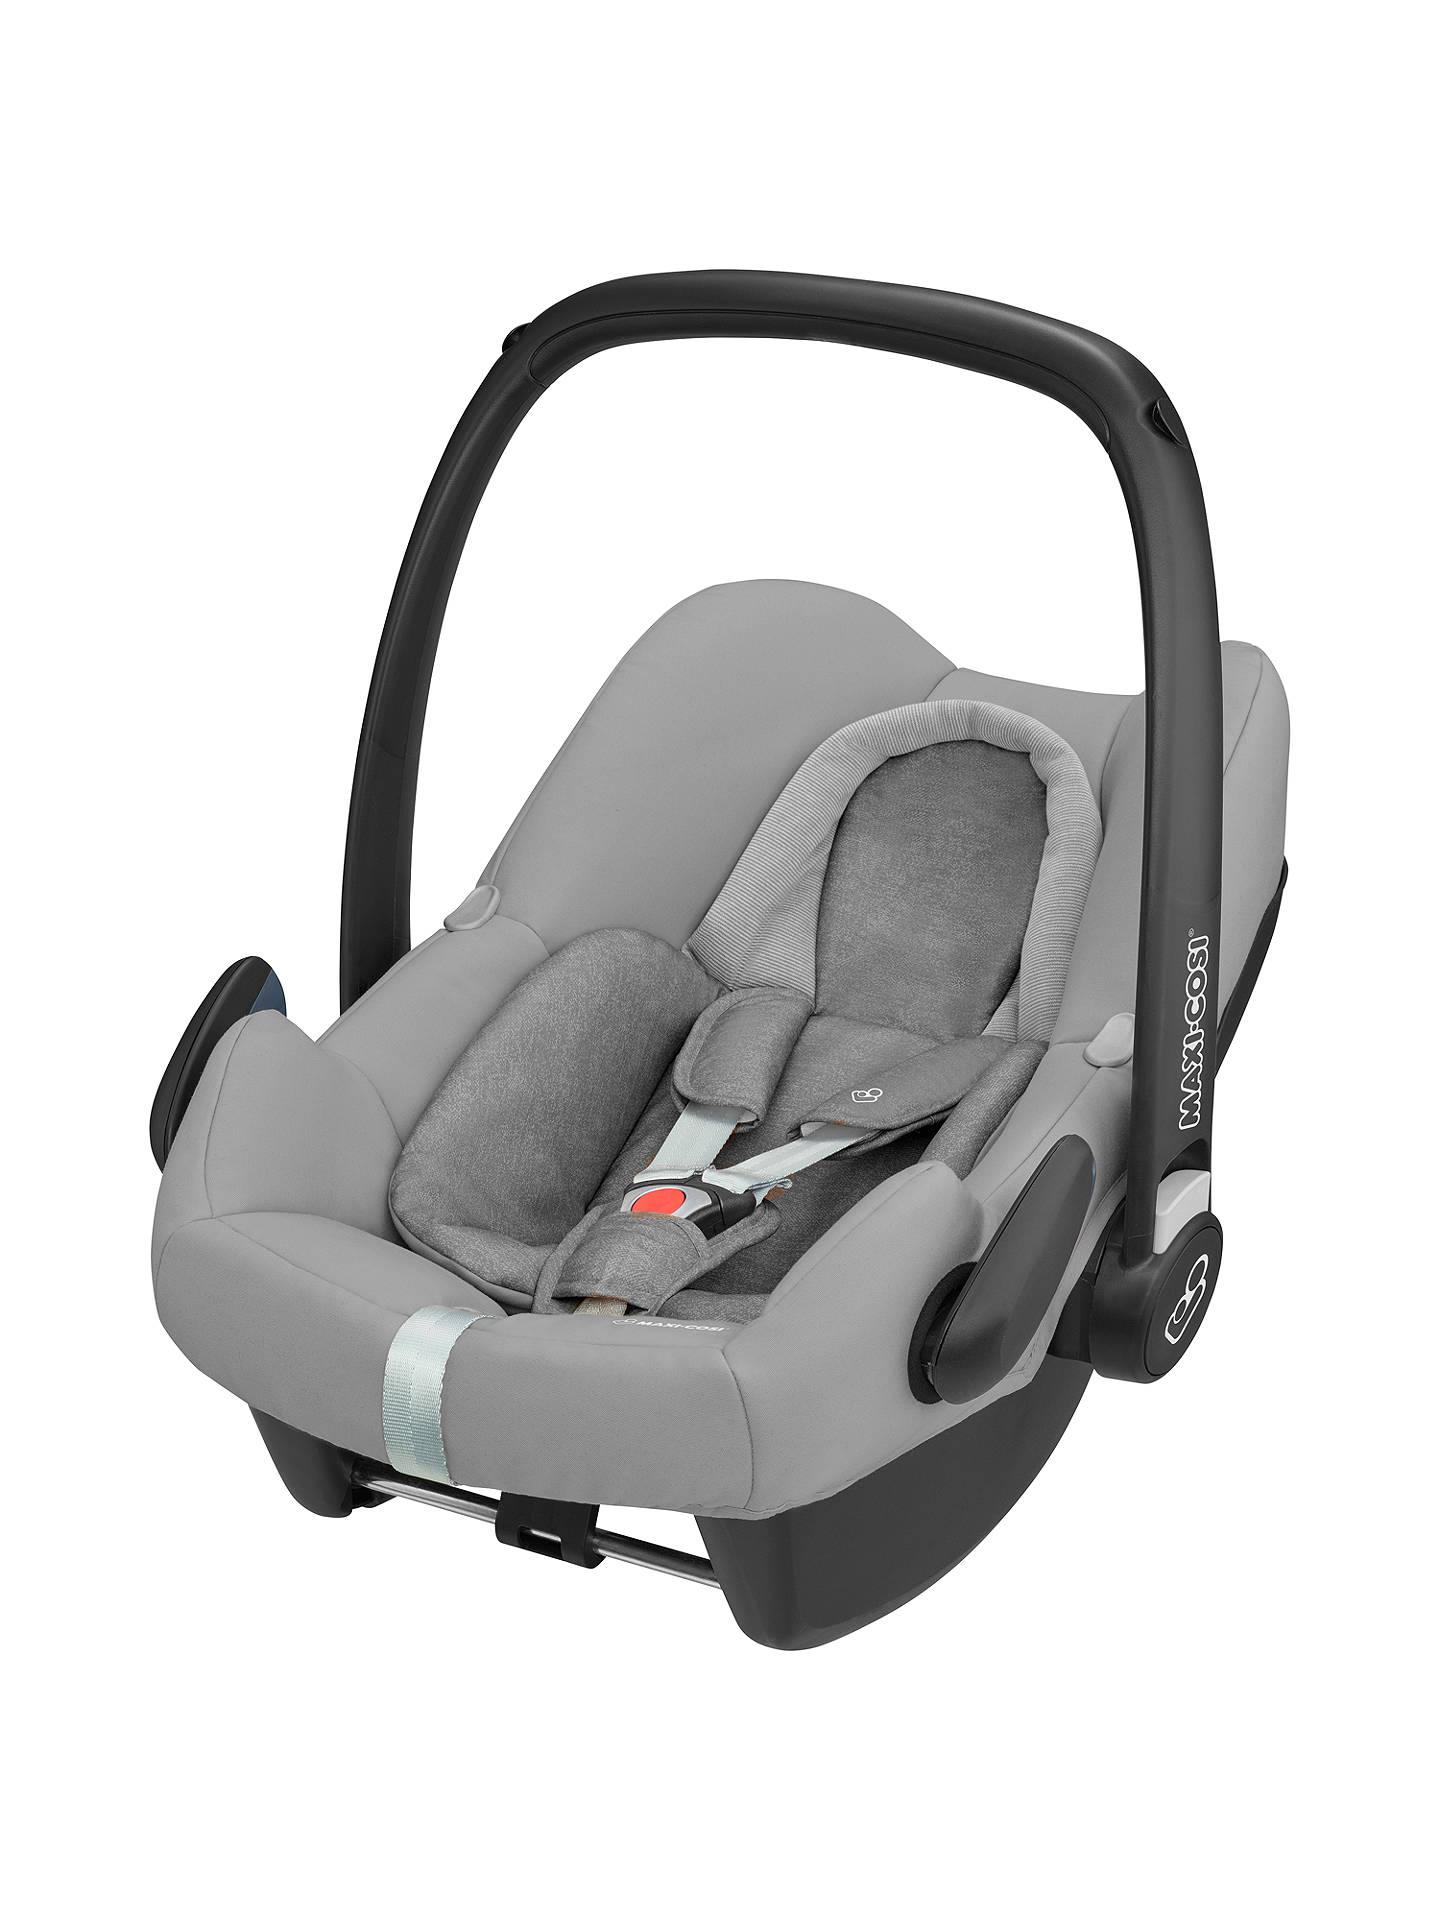 Maxi Cosi Rock Group 0+ I Size Baby Car Seat, Nomad Grey by Maxi Cosi